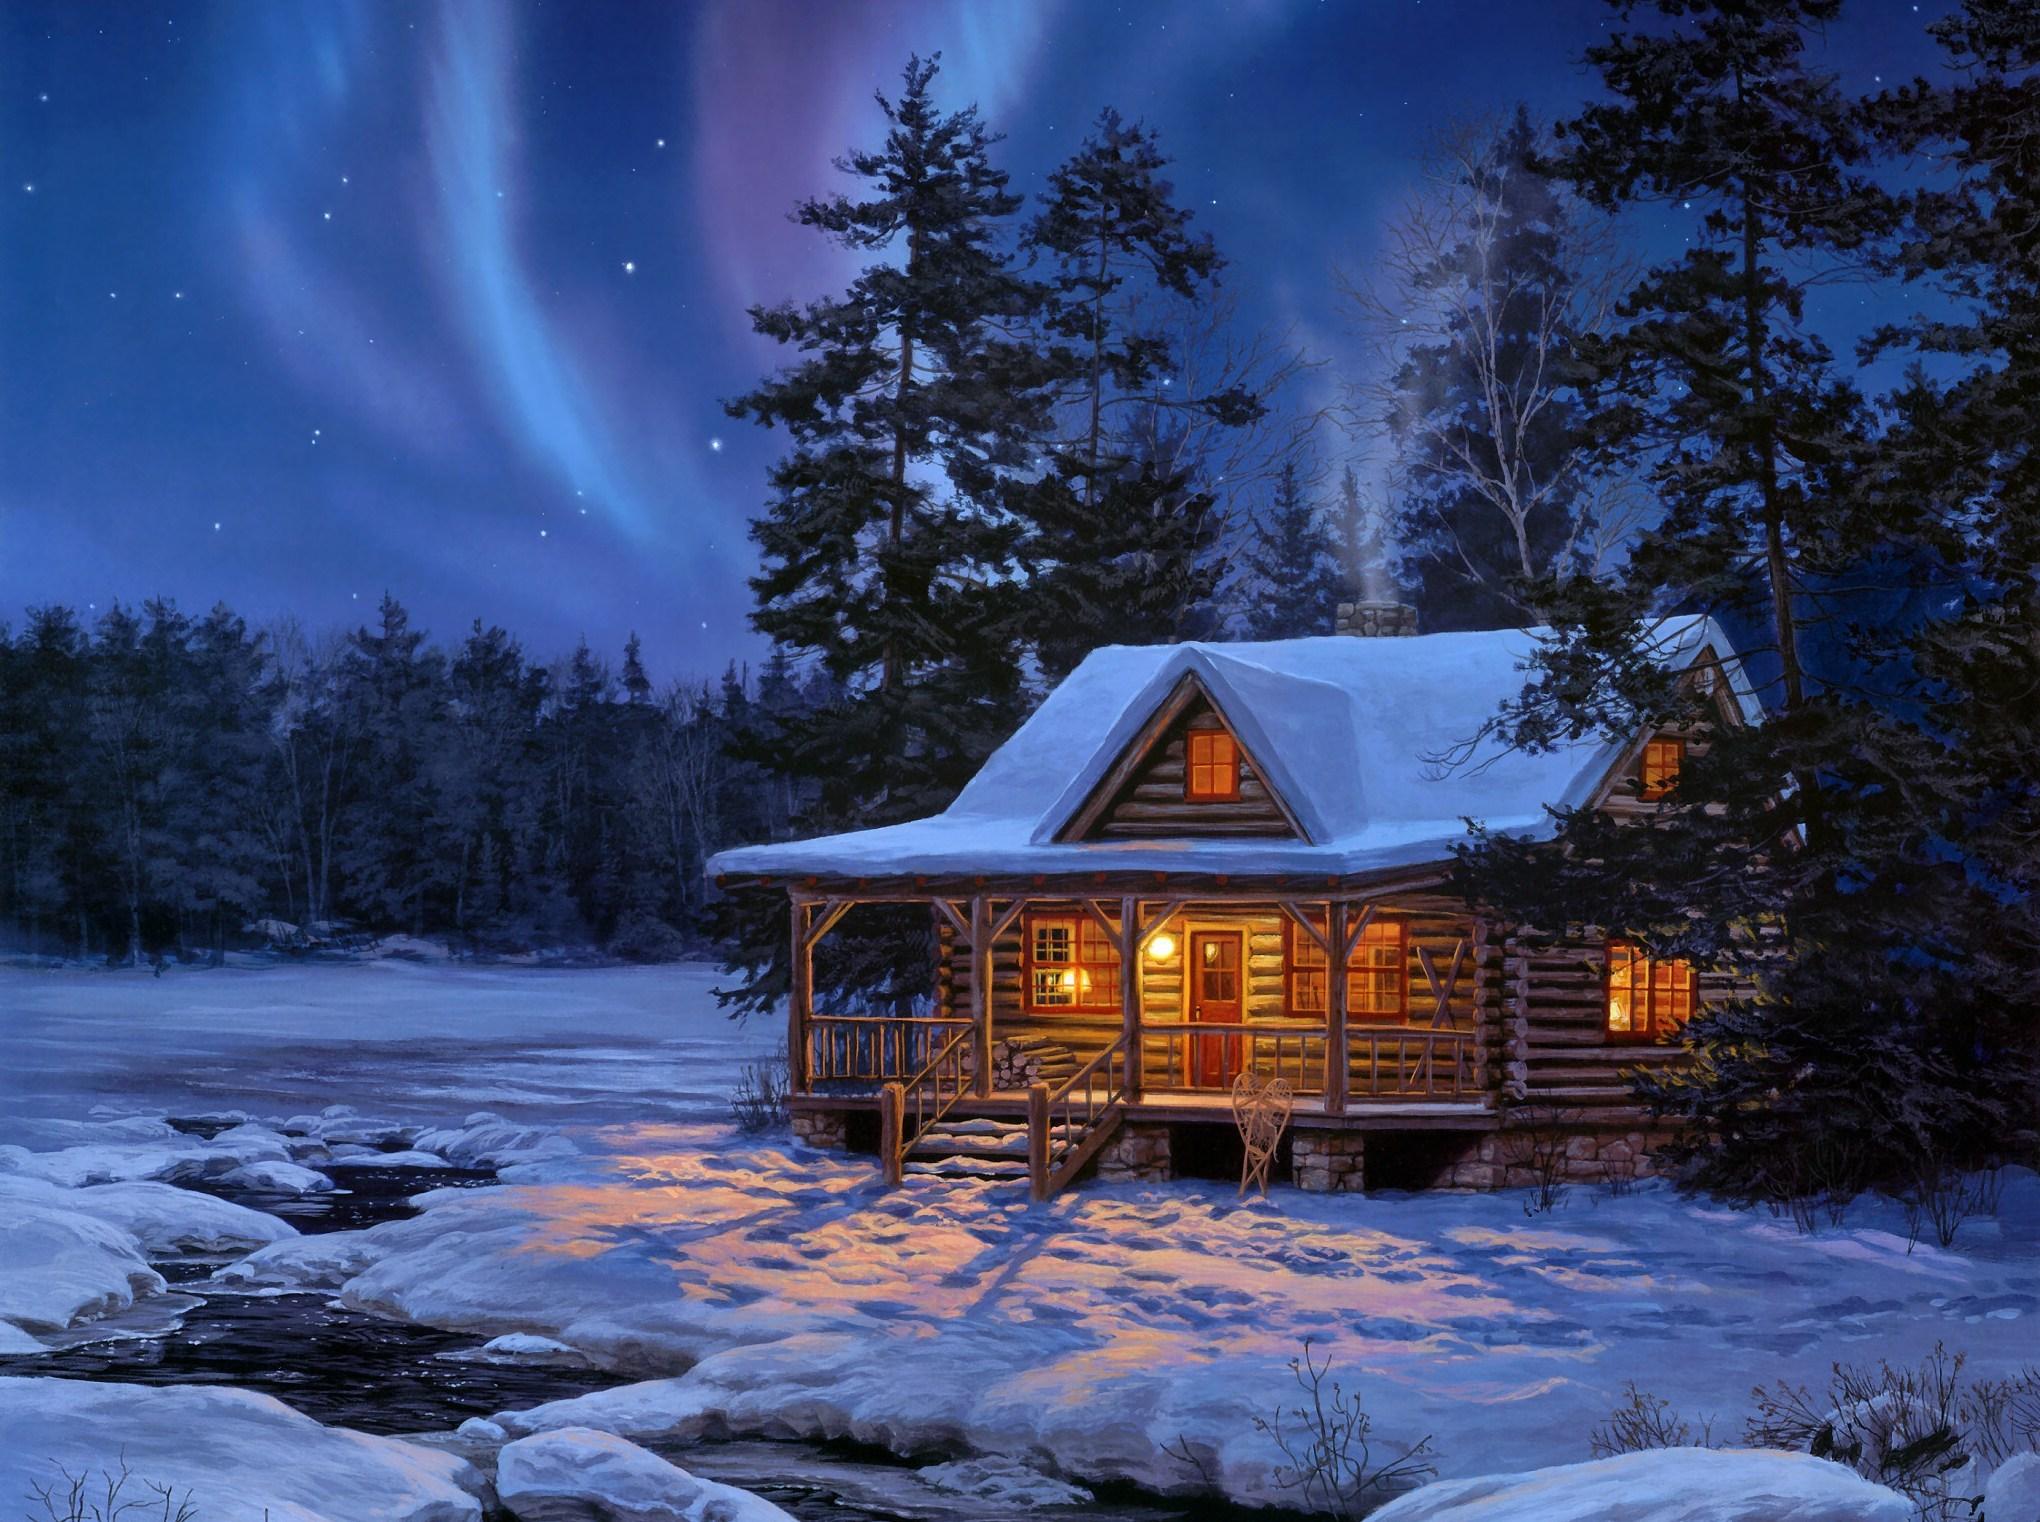 Картинки домик в снегу